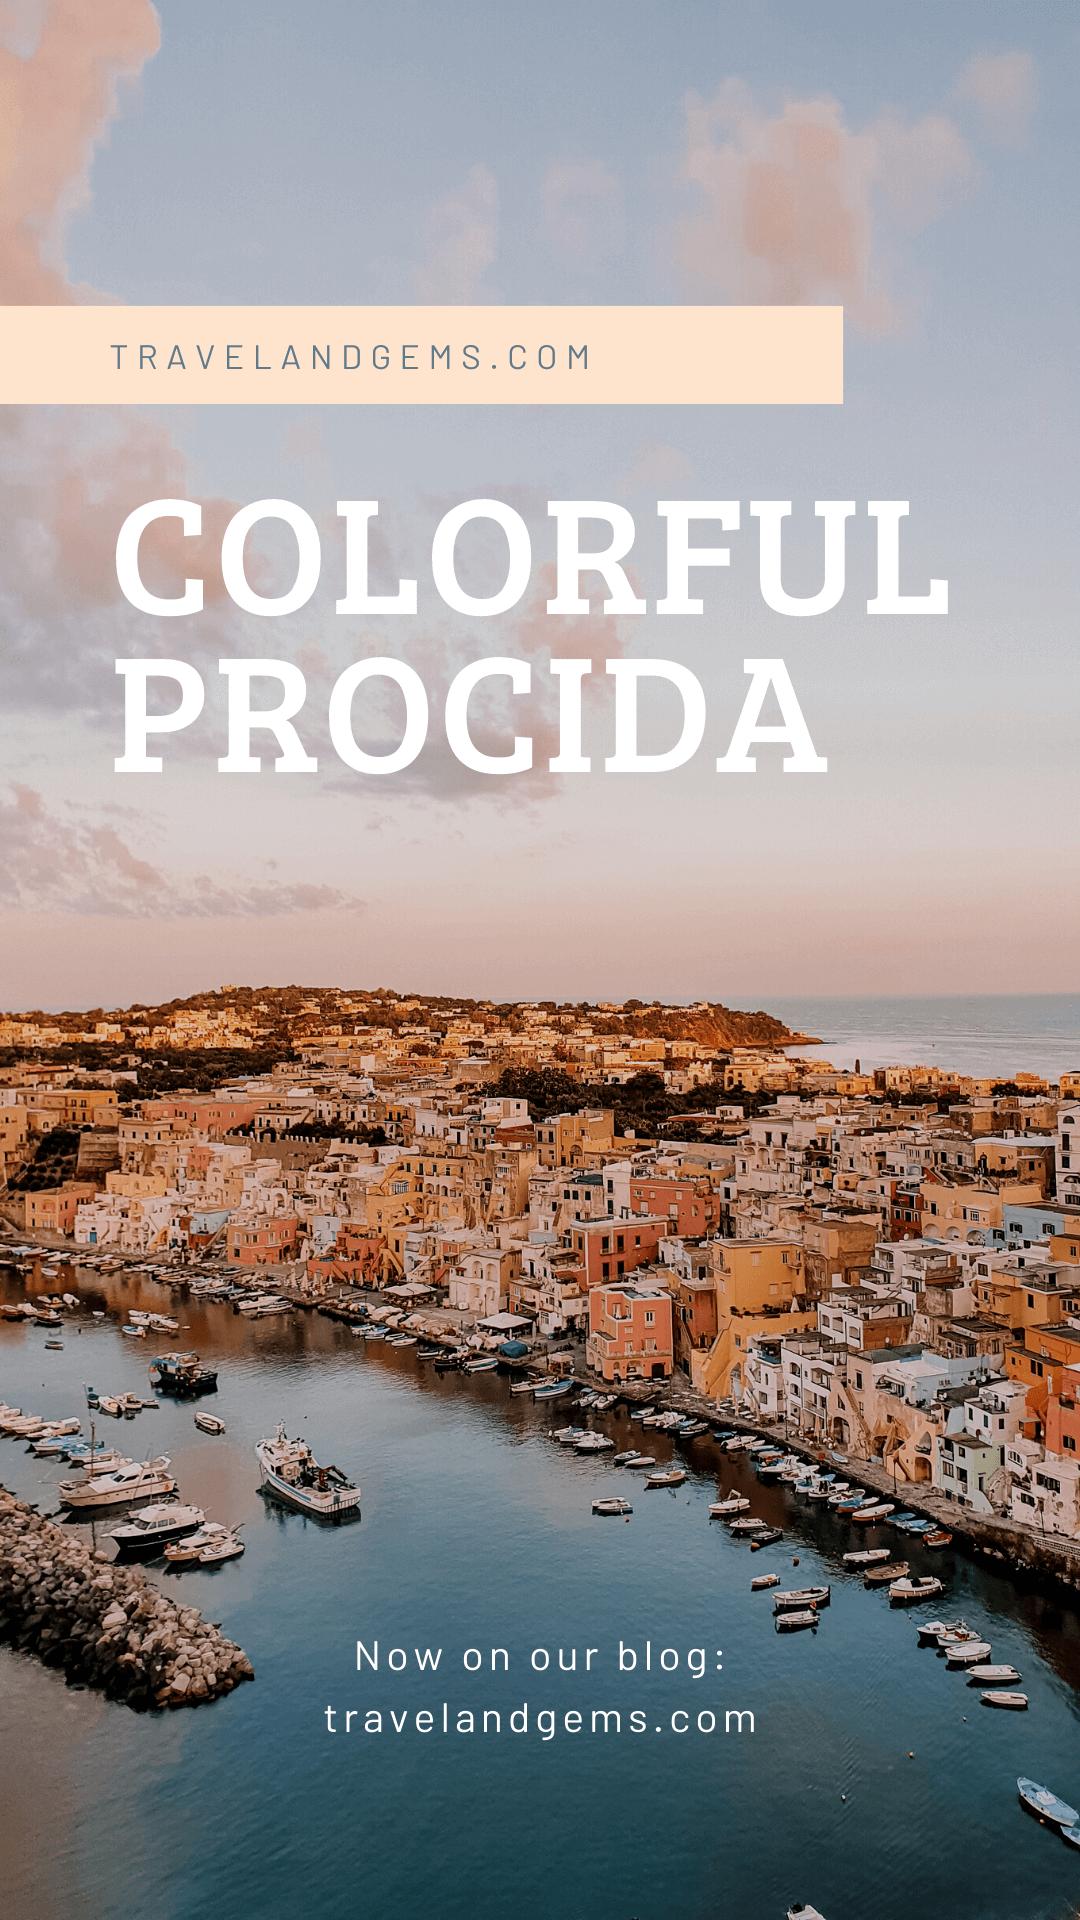 Colorful Procida - Travel & Gems